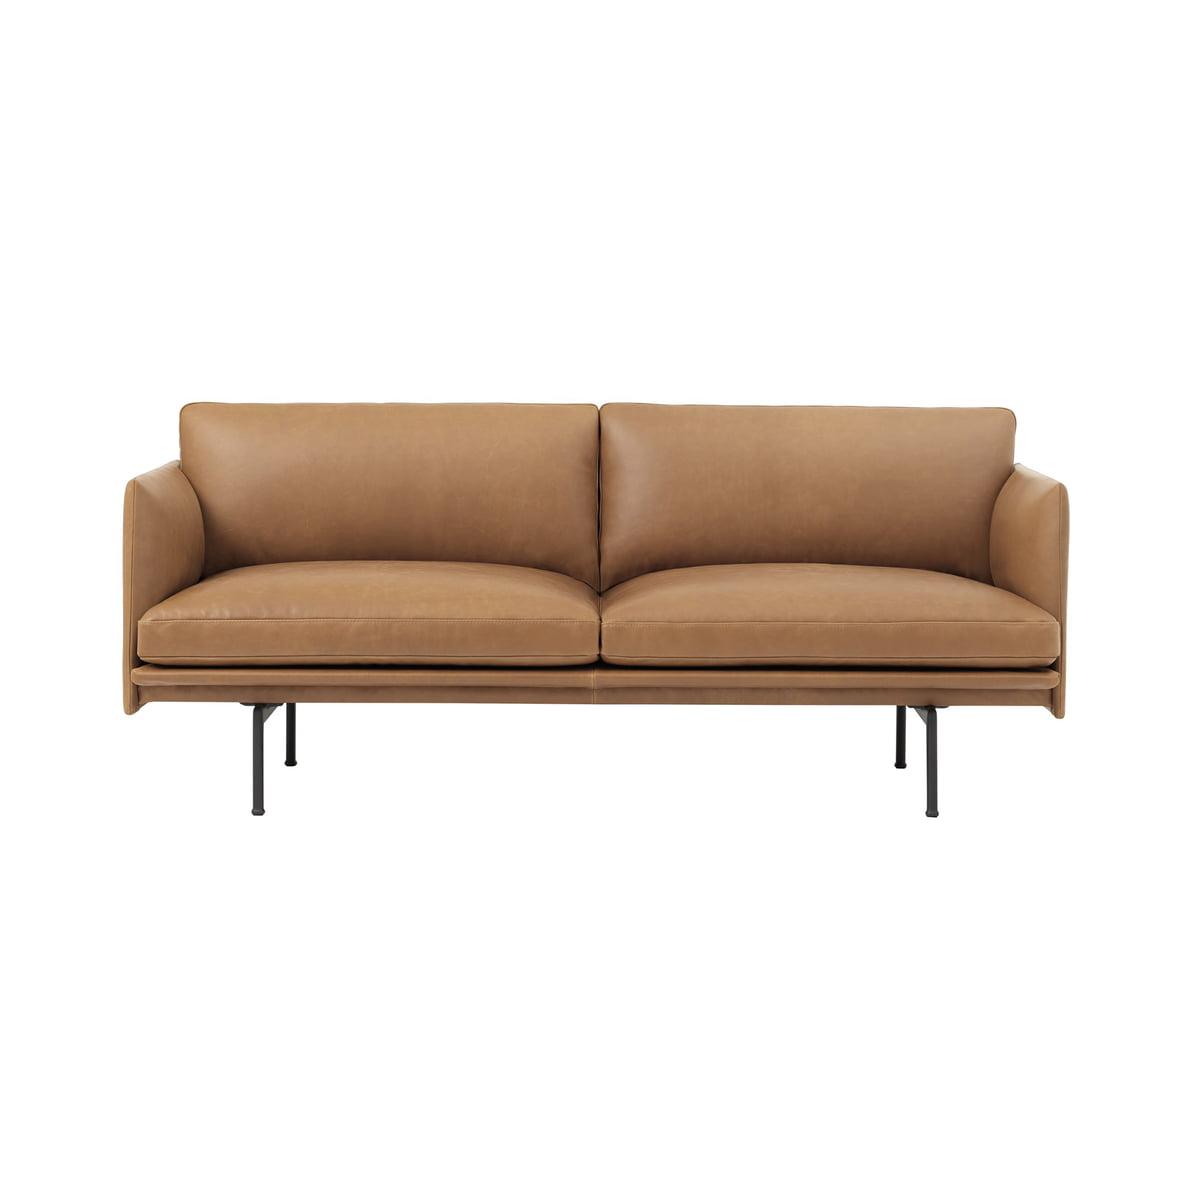 Muuto outline sofa 2 sitzer cognac silk leather verkehrsschwarz frei